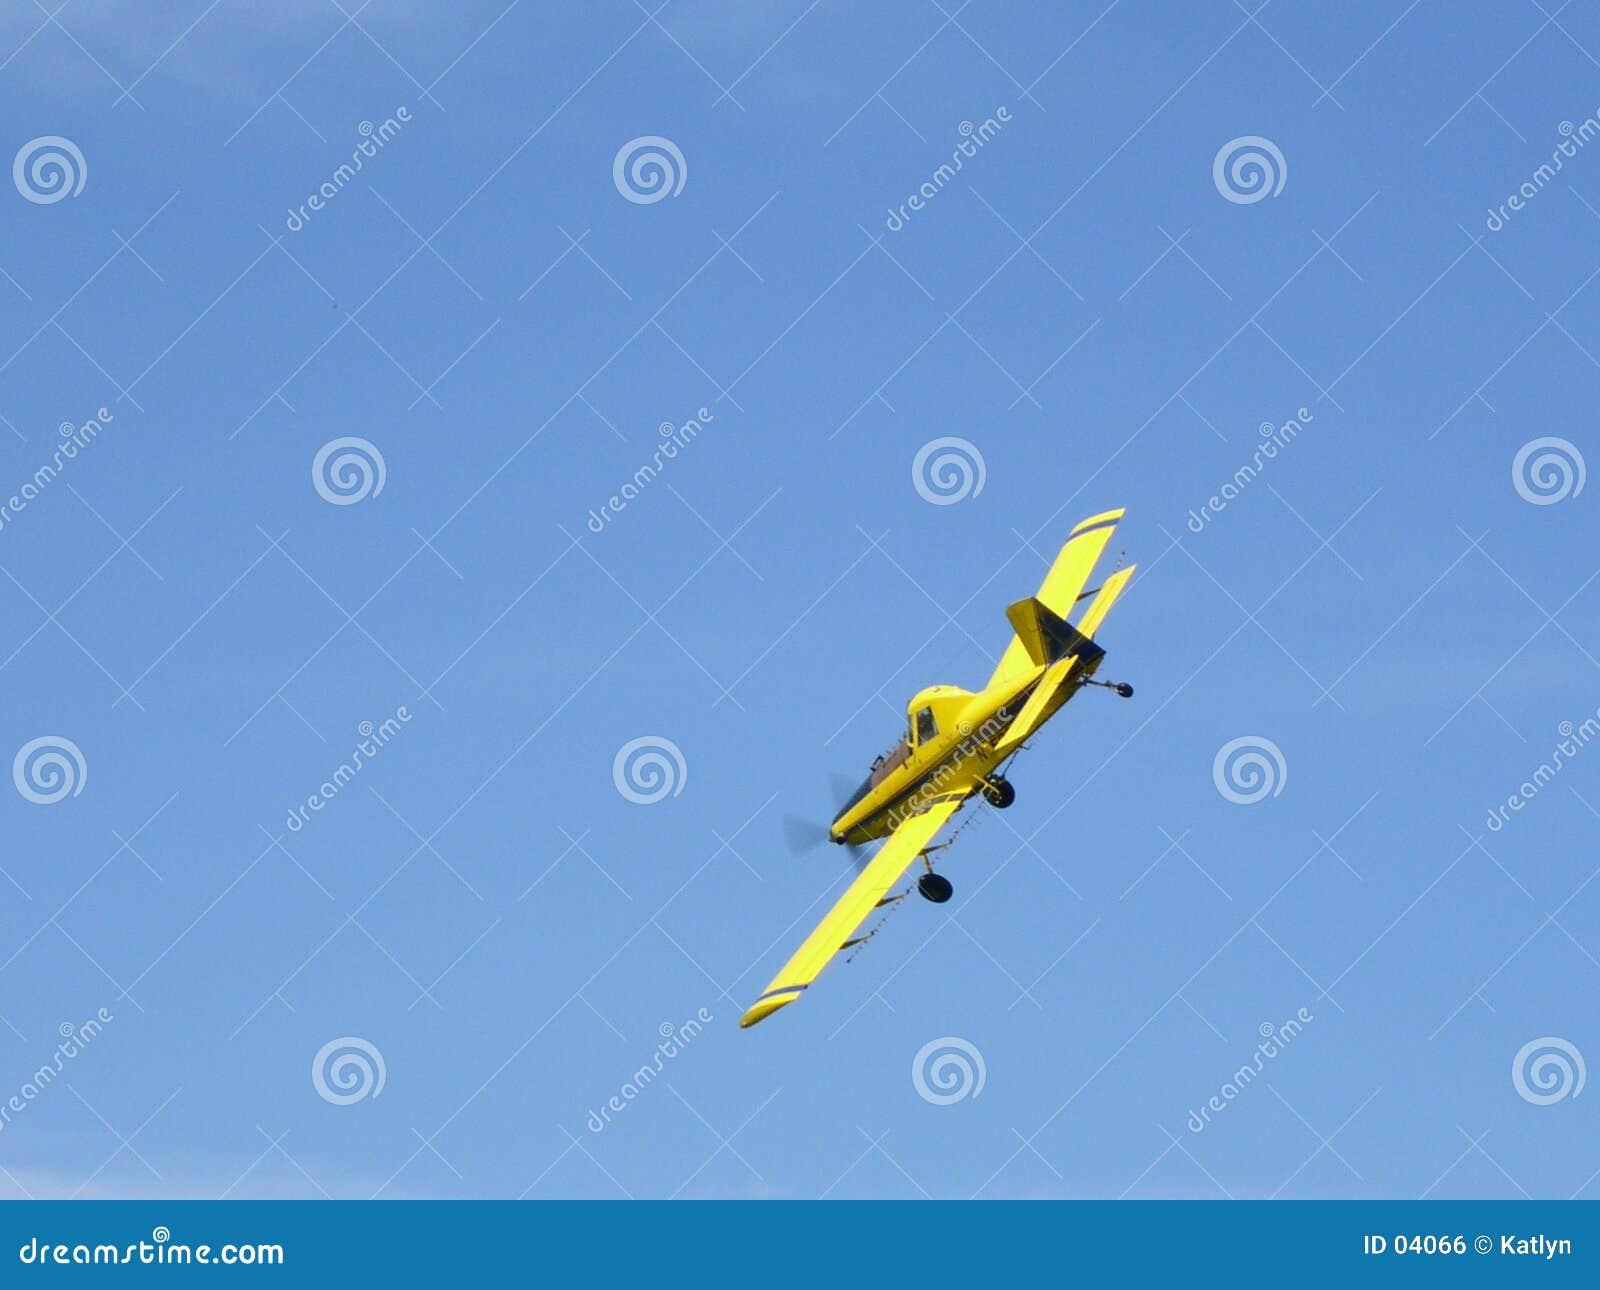 Crop Duster - Airplane